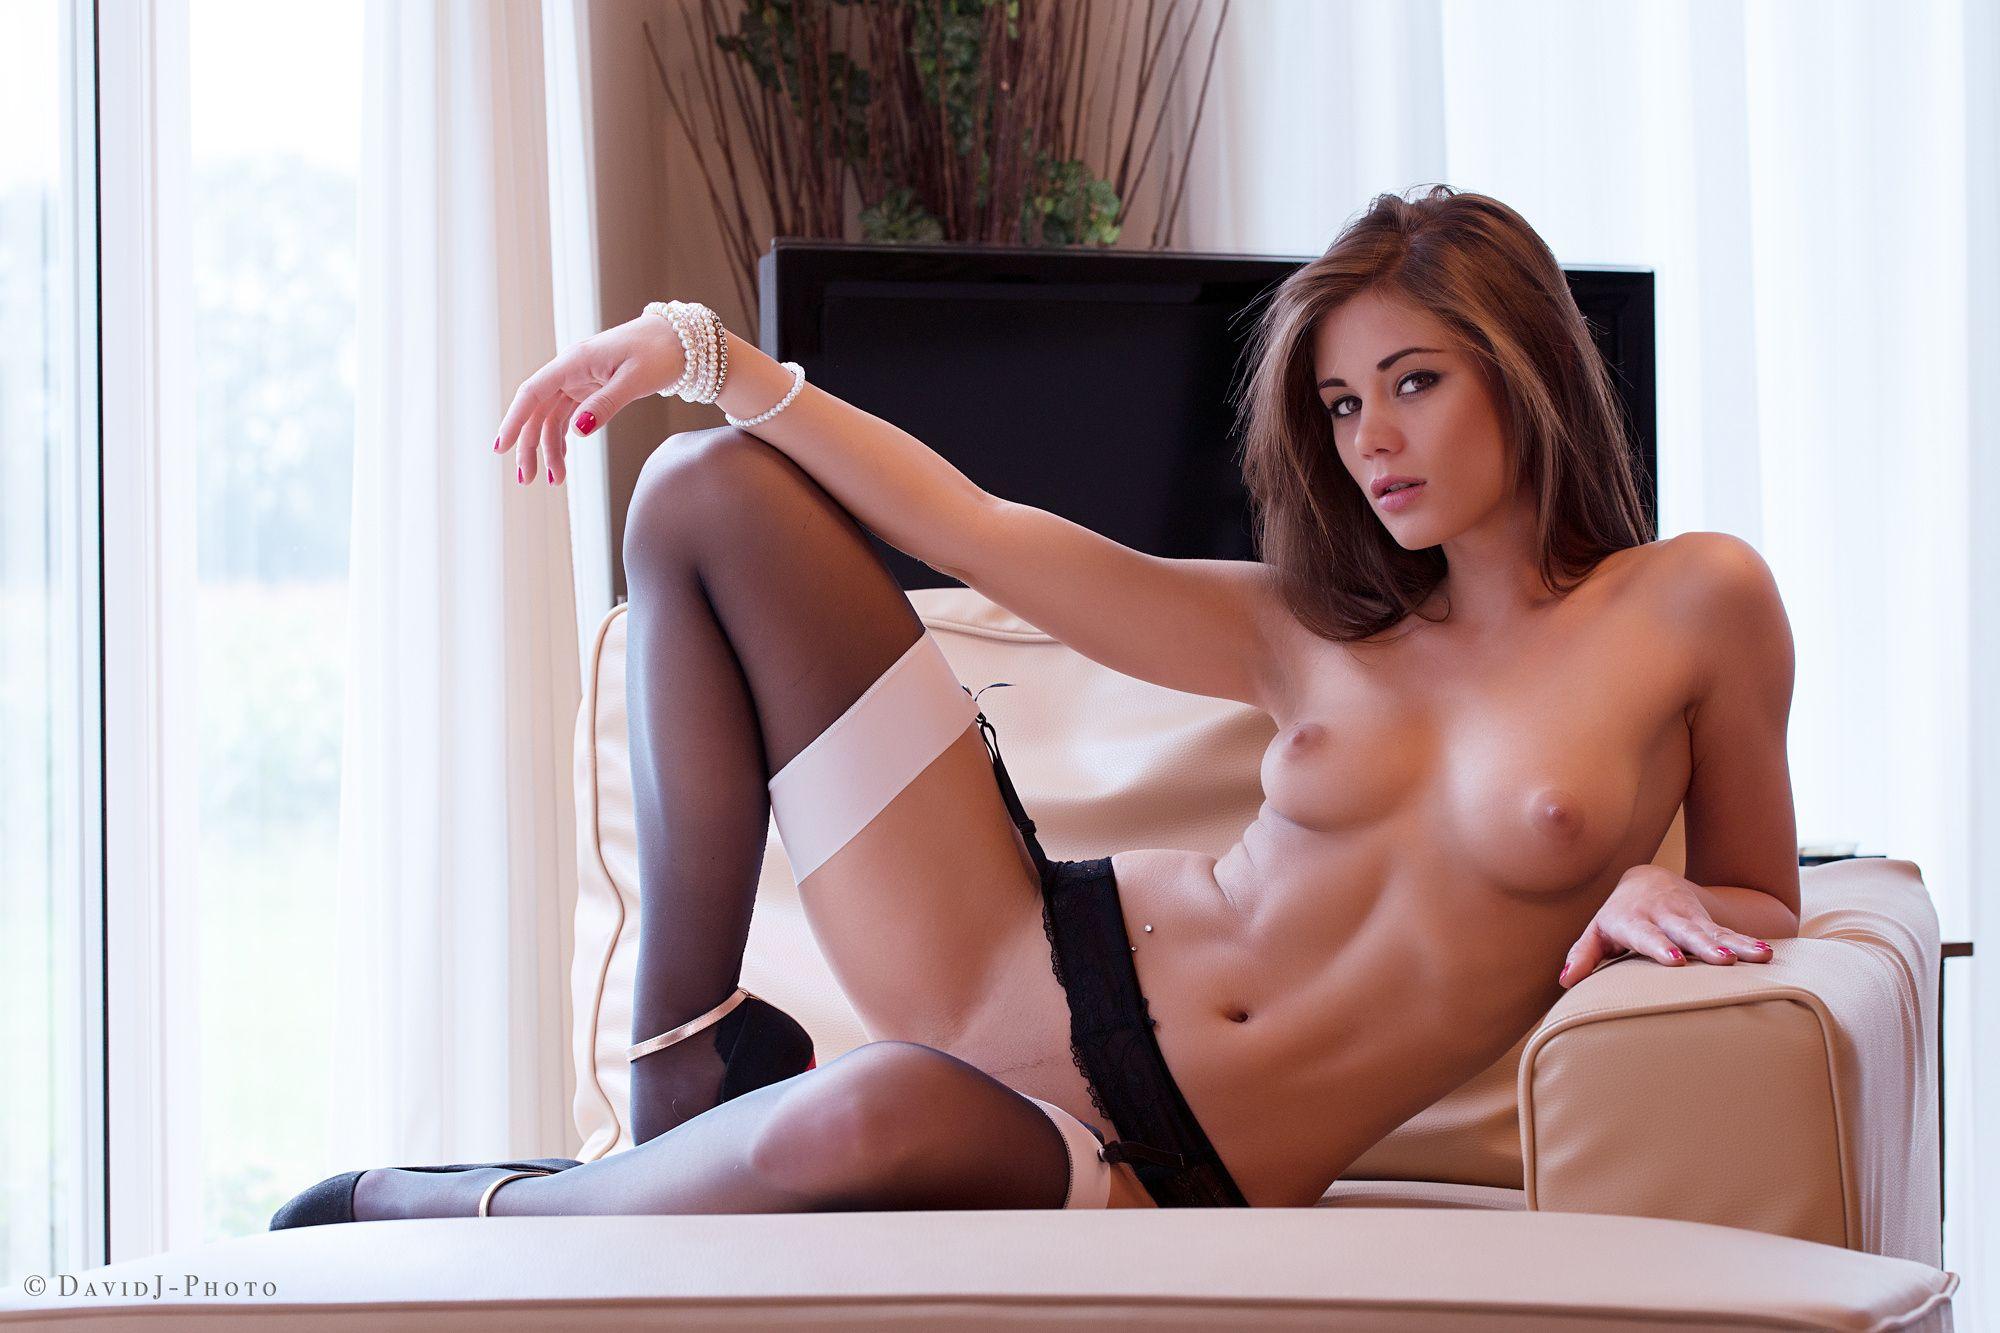 Лайф видео порнозвезда каприс видео секс